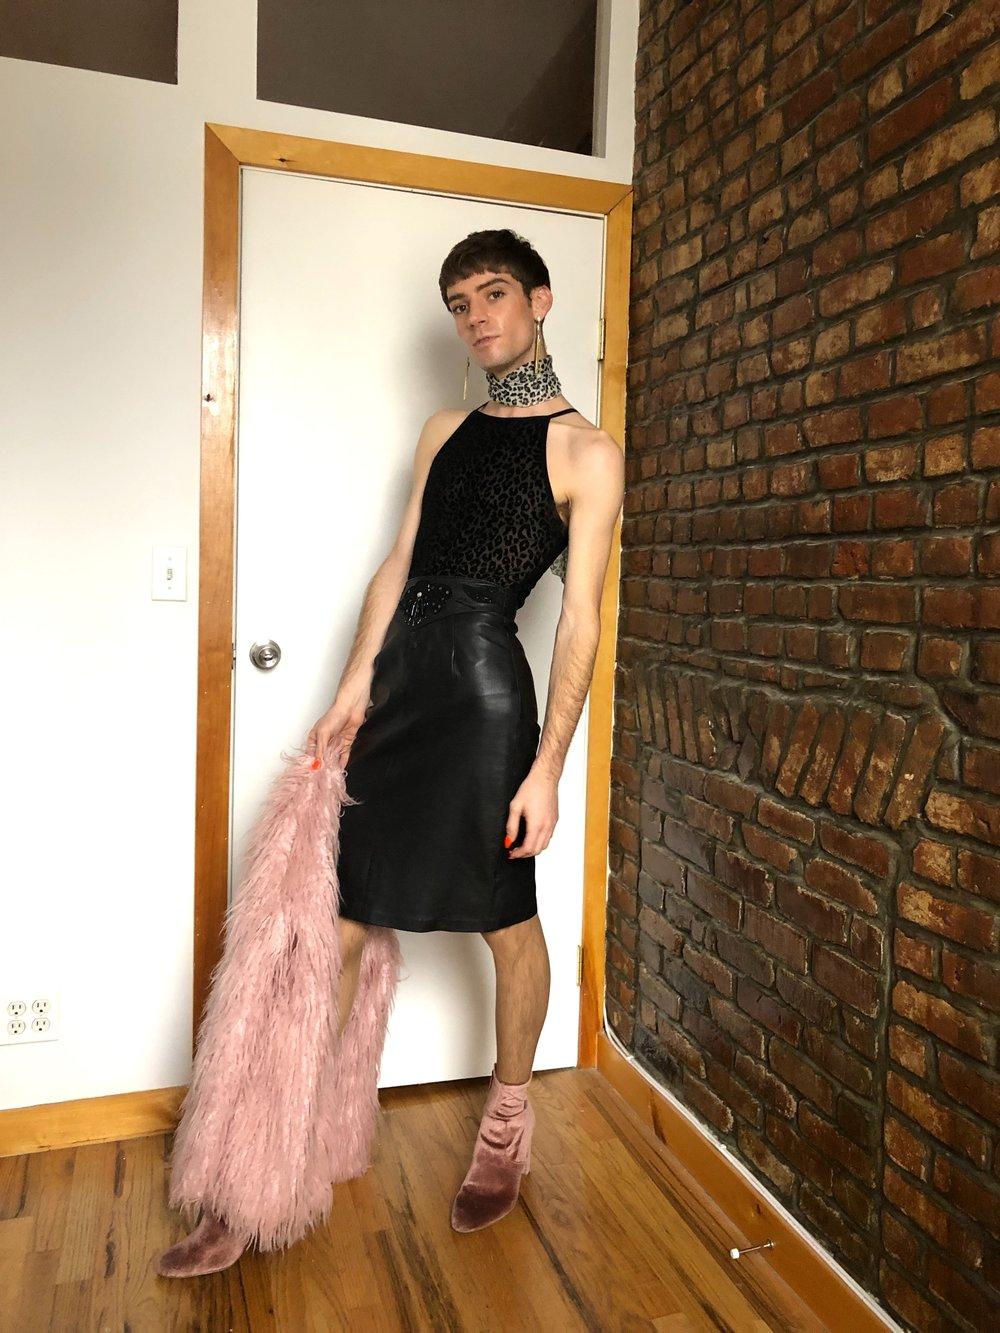 Leopard & Leather - Model: Trevor HildebrandEarrings: Unknown, thriftedNeck Scarf: Vintage, Purchased in BerlinBodysuit: Forever 21Skirt: BagatelleJacket: Some Days LovinShoes: Steve Madden